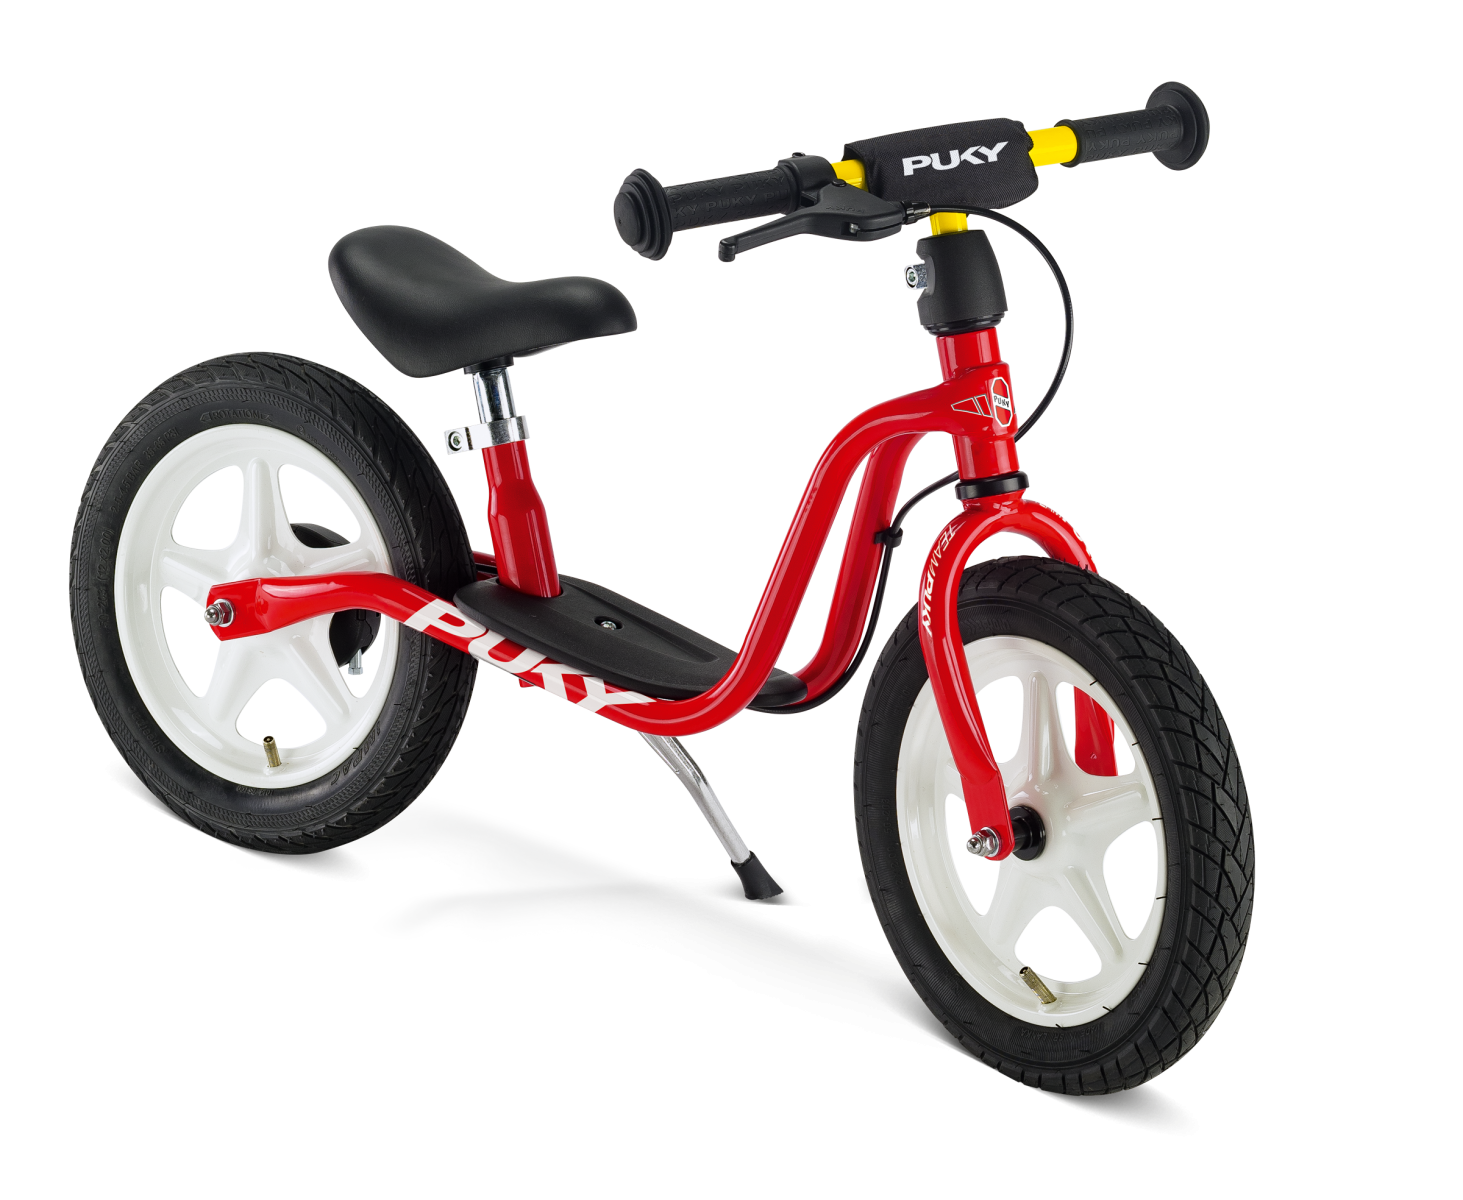 Puky - Balance Bike - LR 1 L Br - Red (4046)